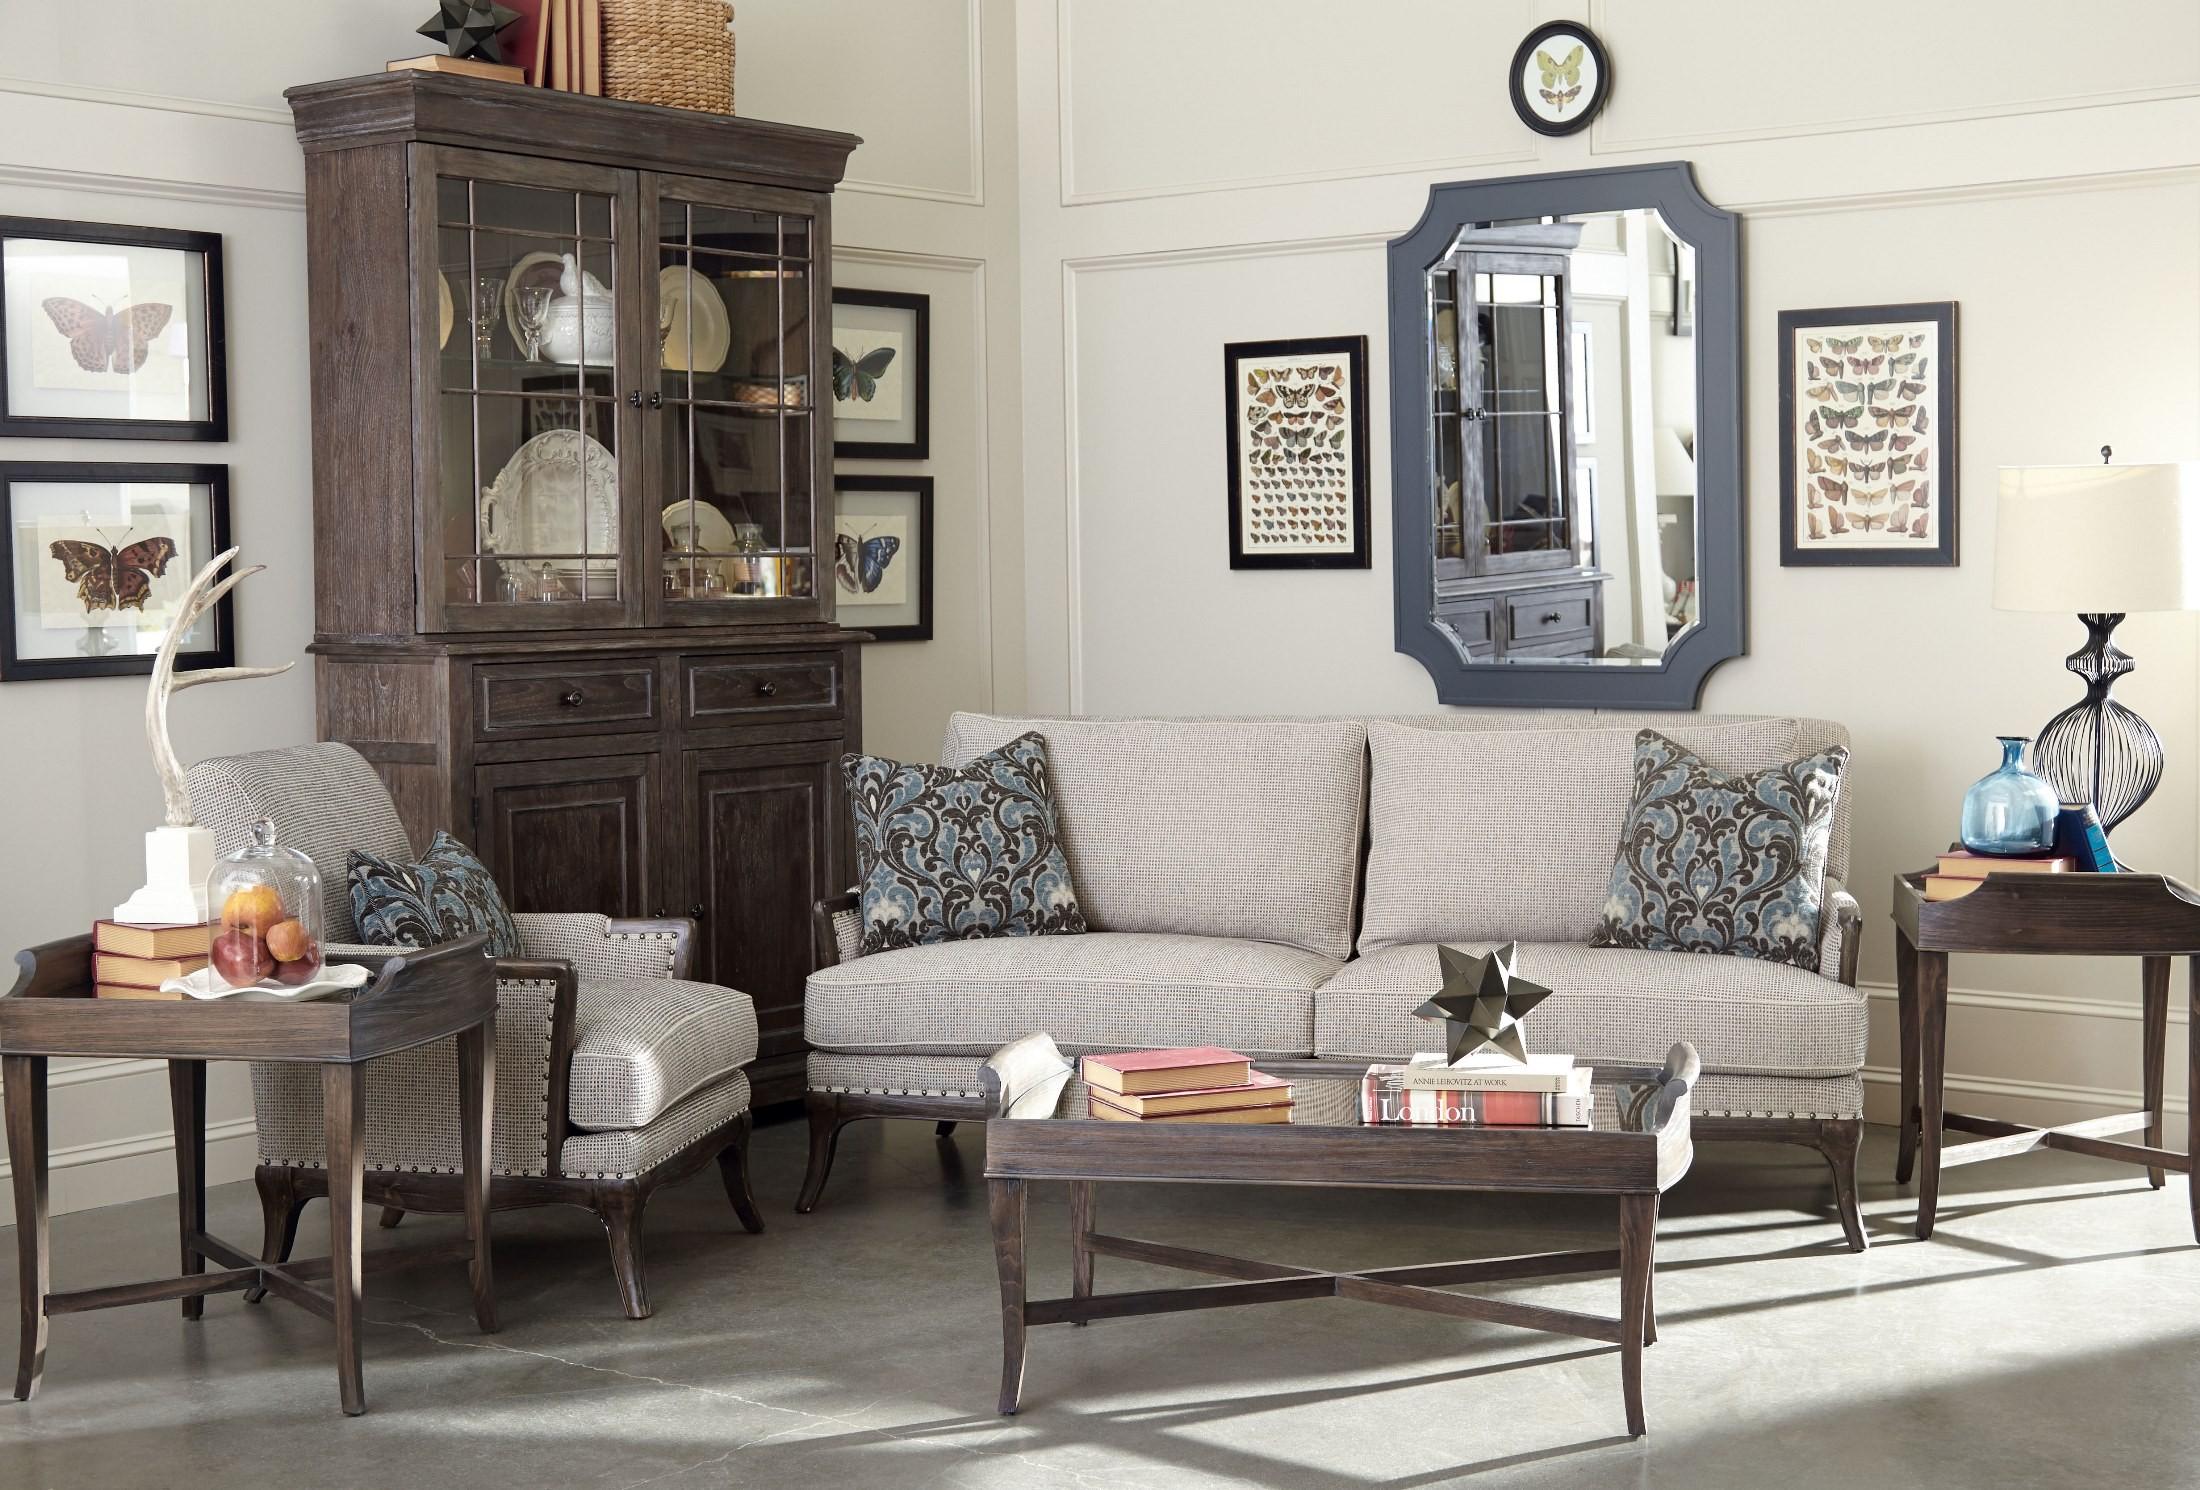 St Germain Siene Pewter Upholstered Living Room Set From Art 515521 5001aa Coleman Furniture